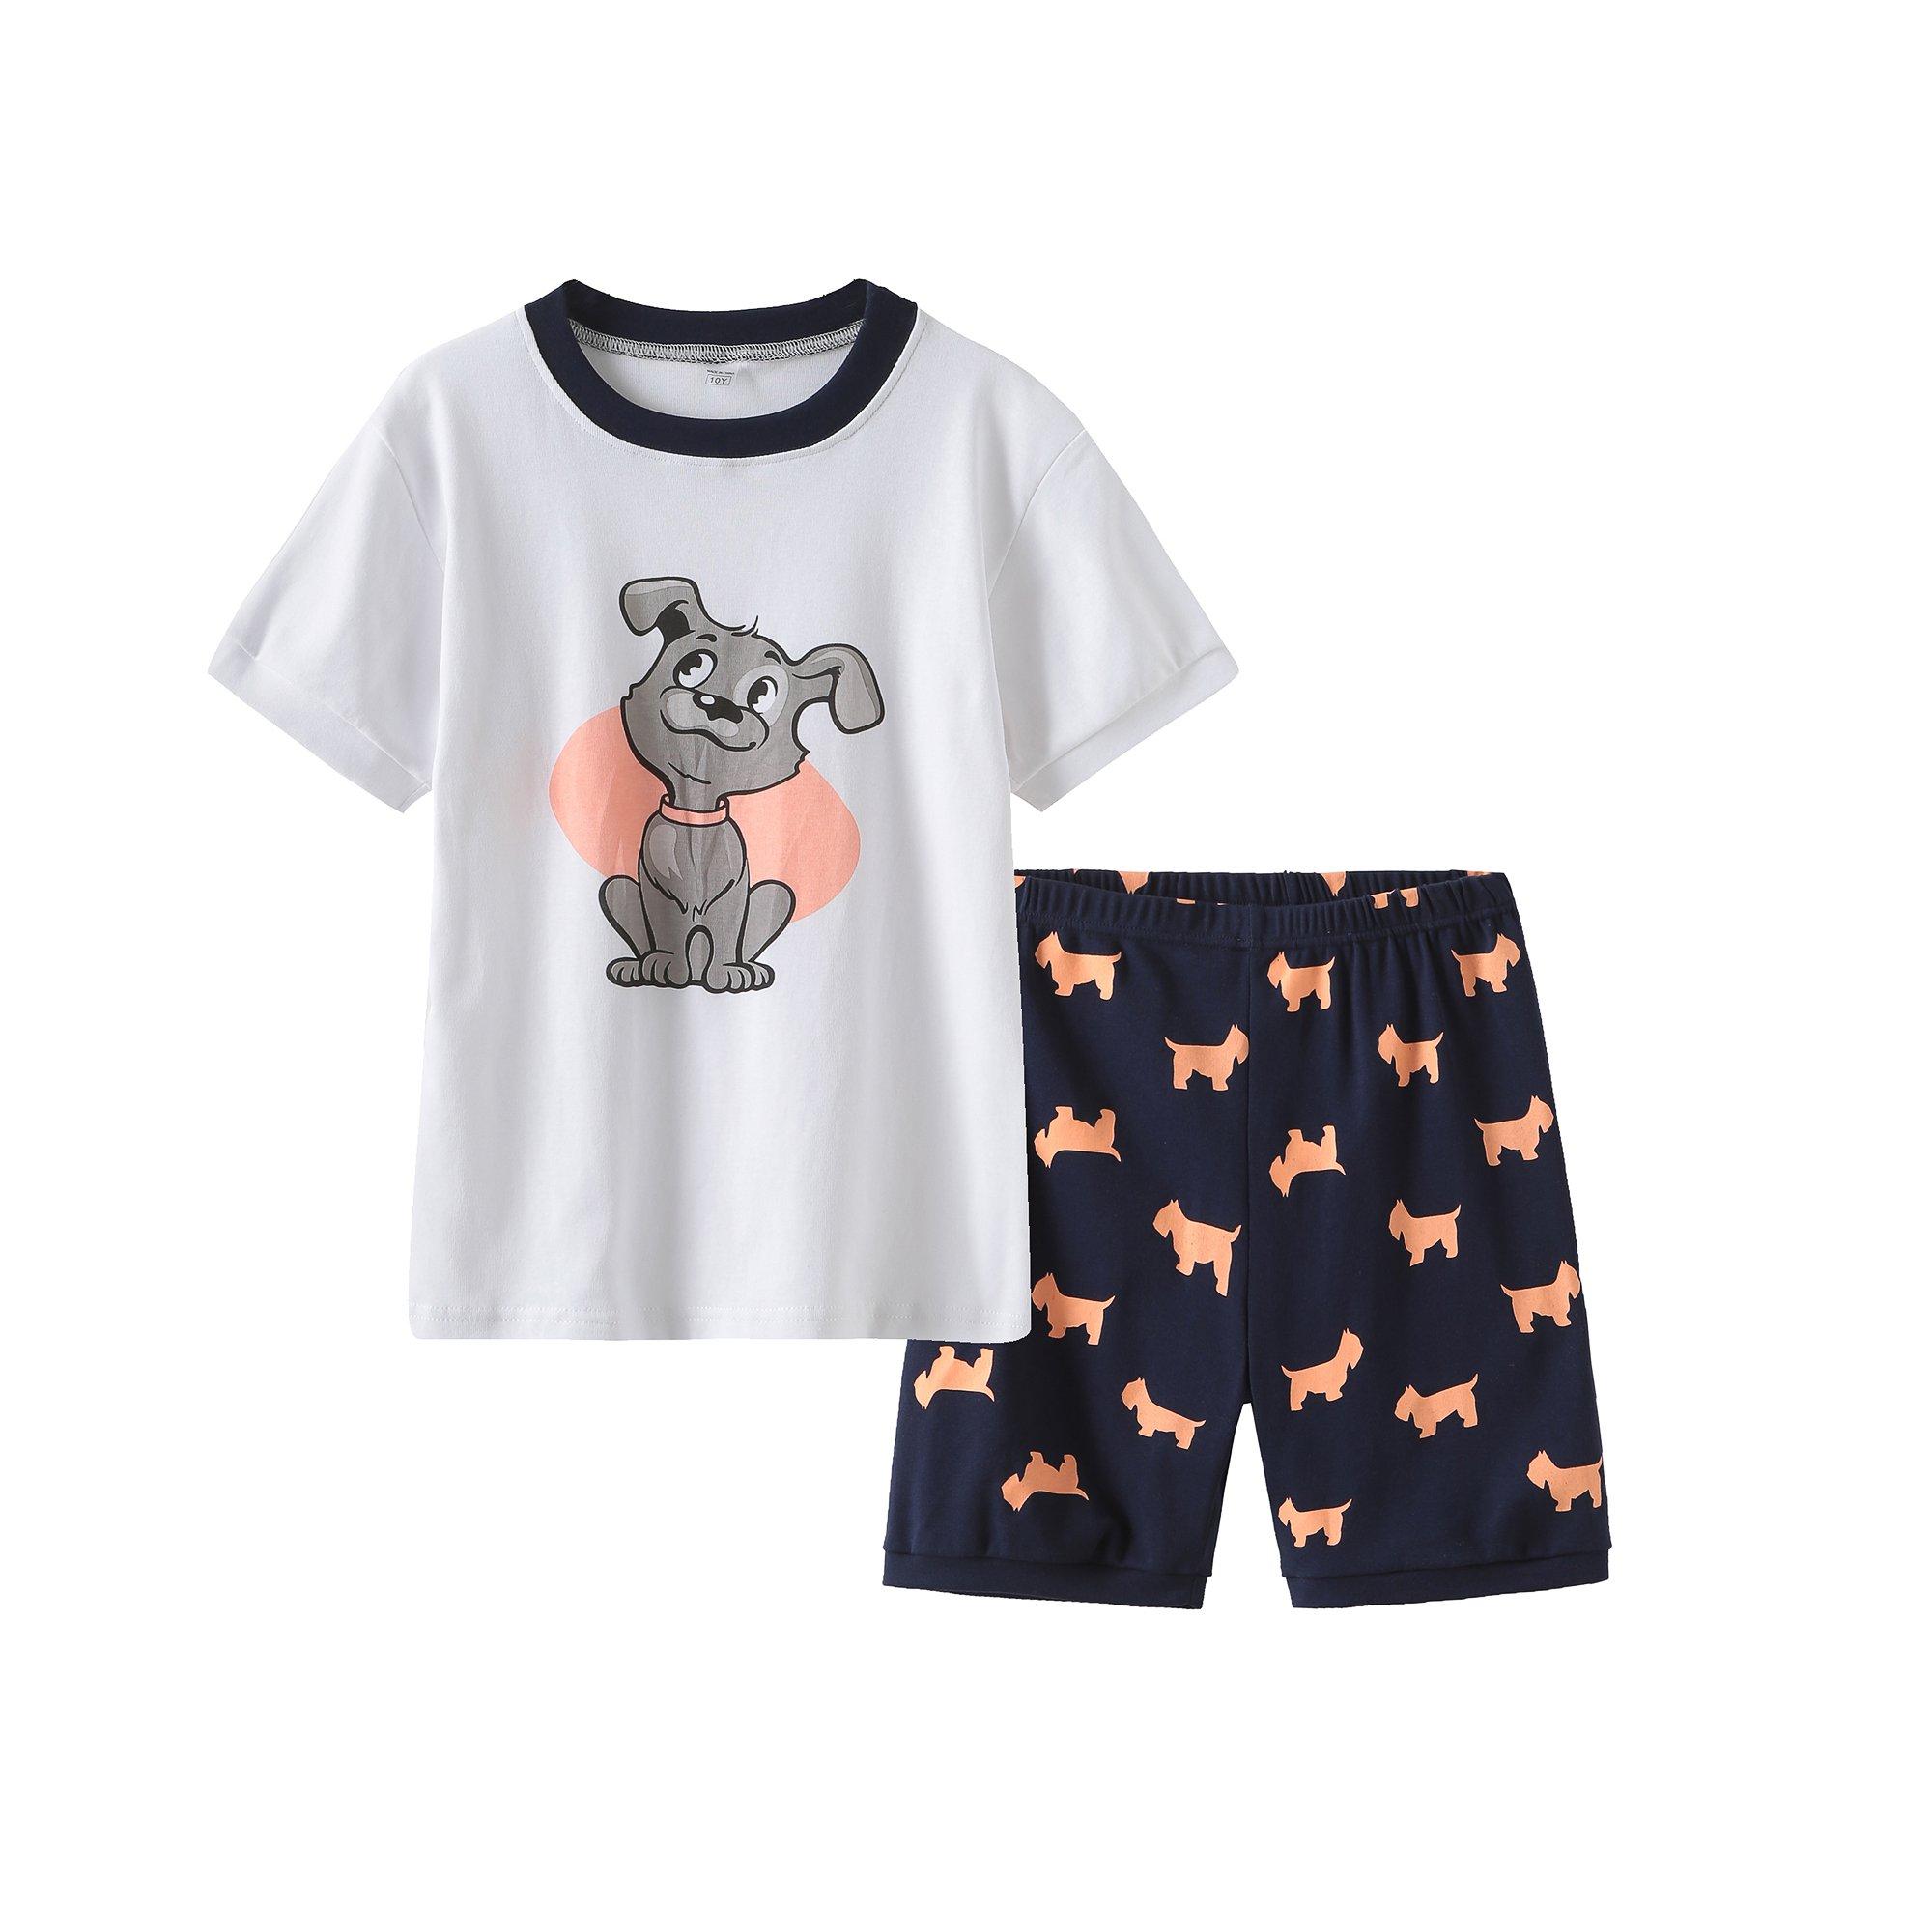 MyFav Summer Cartoon Dog Printed Pajamas Lovely Sleepwear for Big Girls Size 8-14 Years